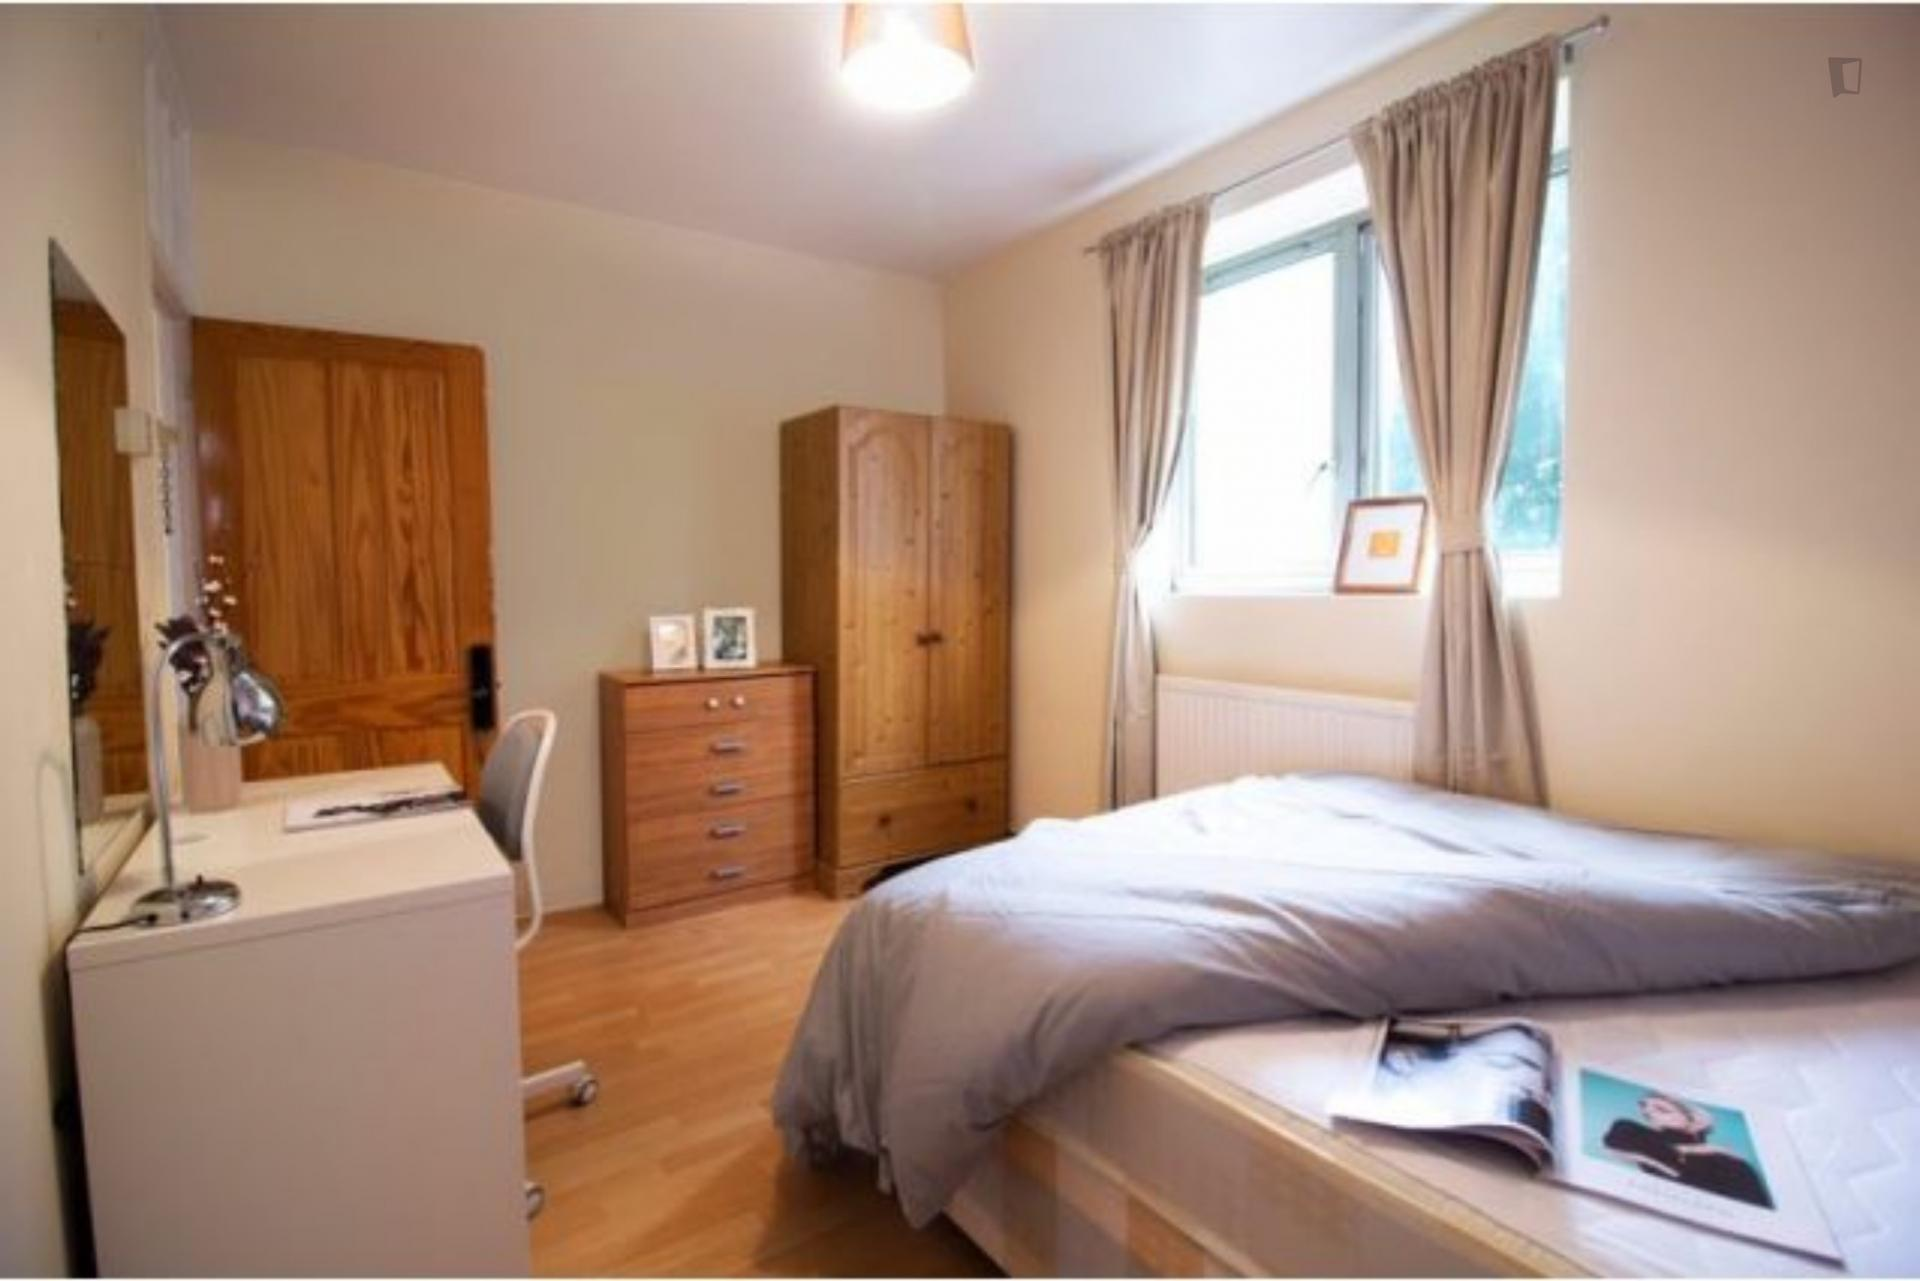 Wallwood - Furnished bedroom in London